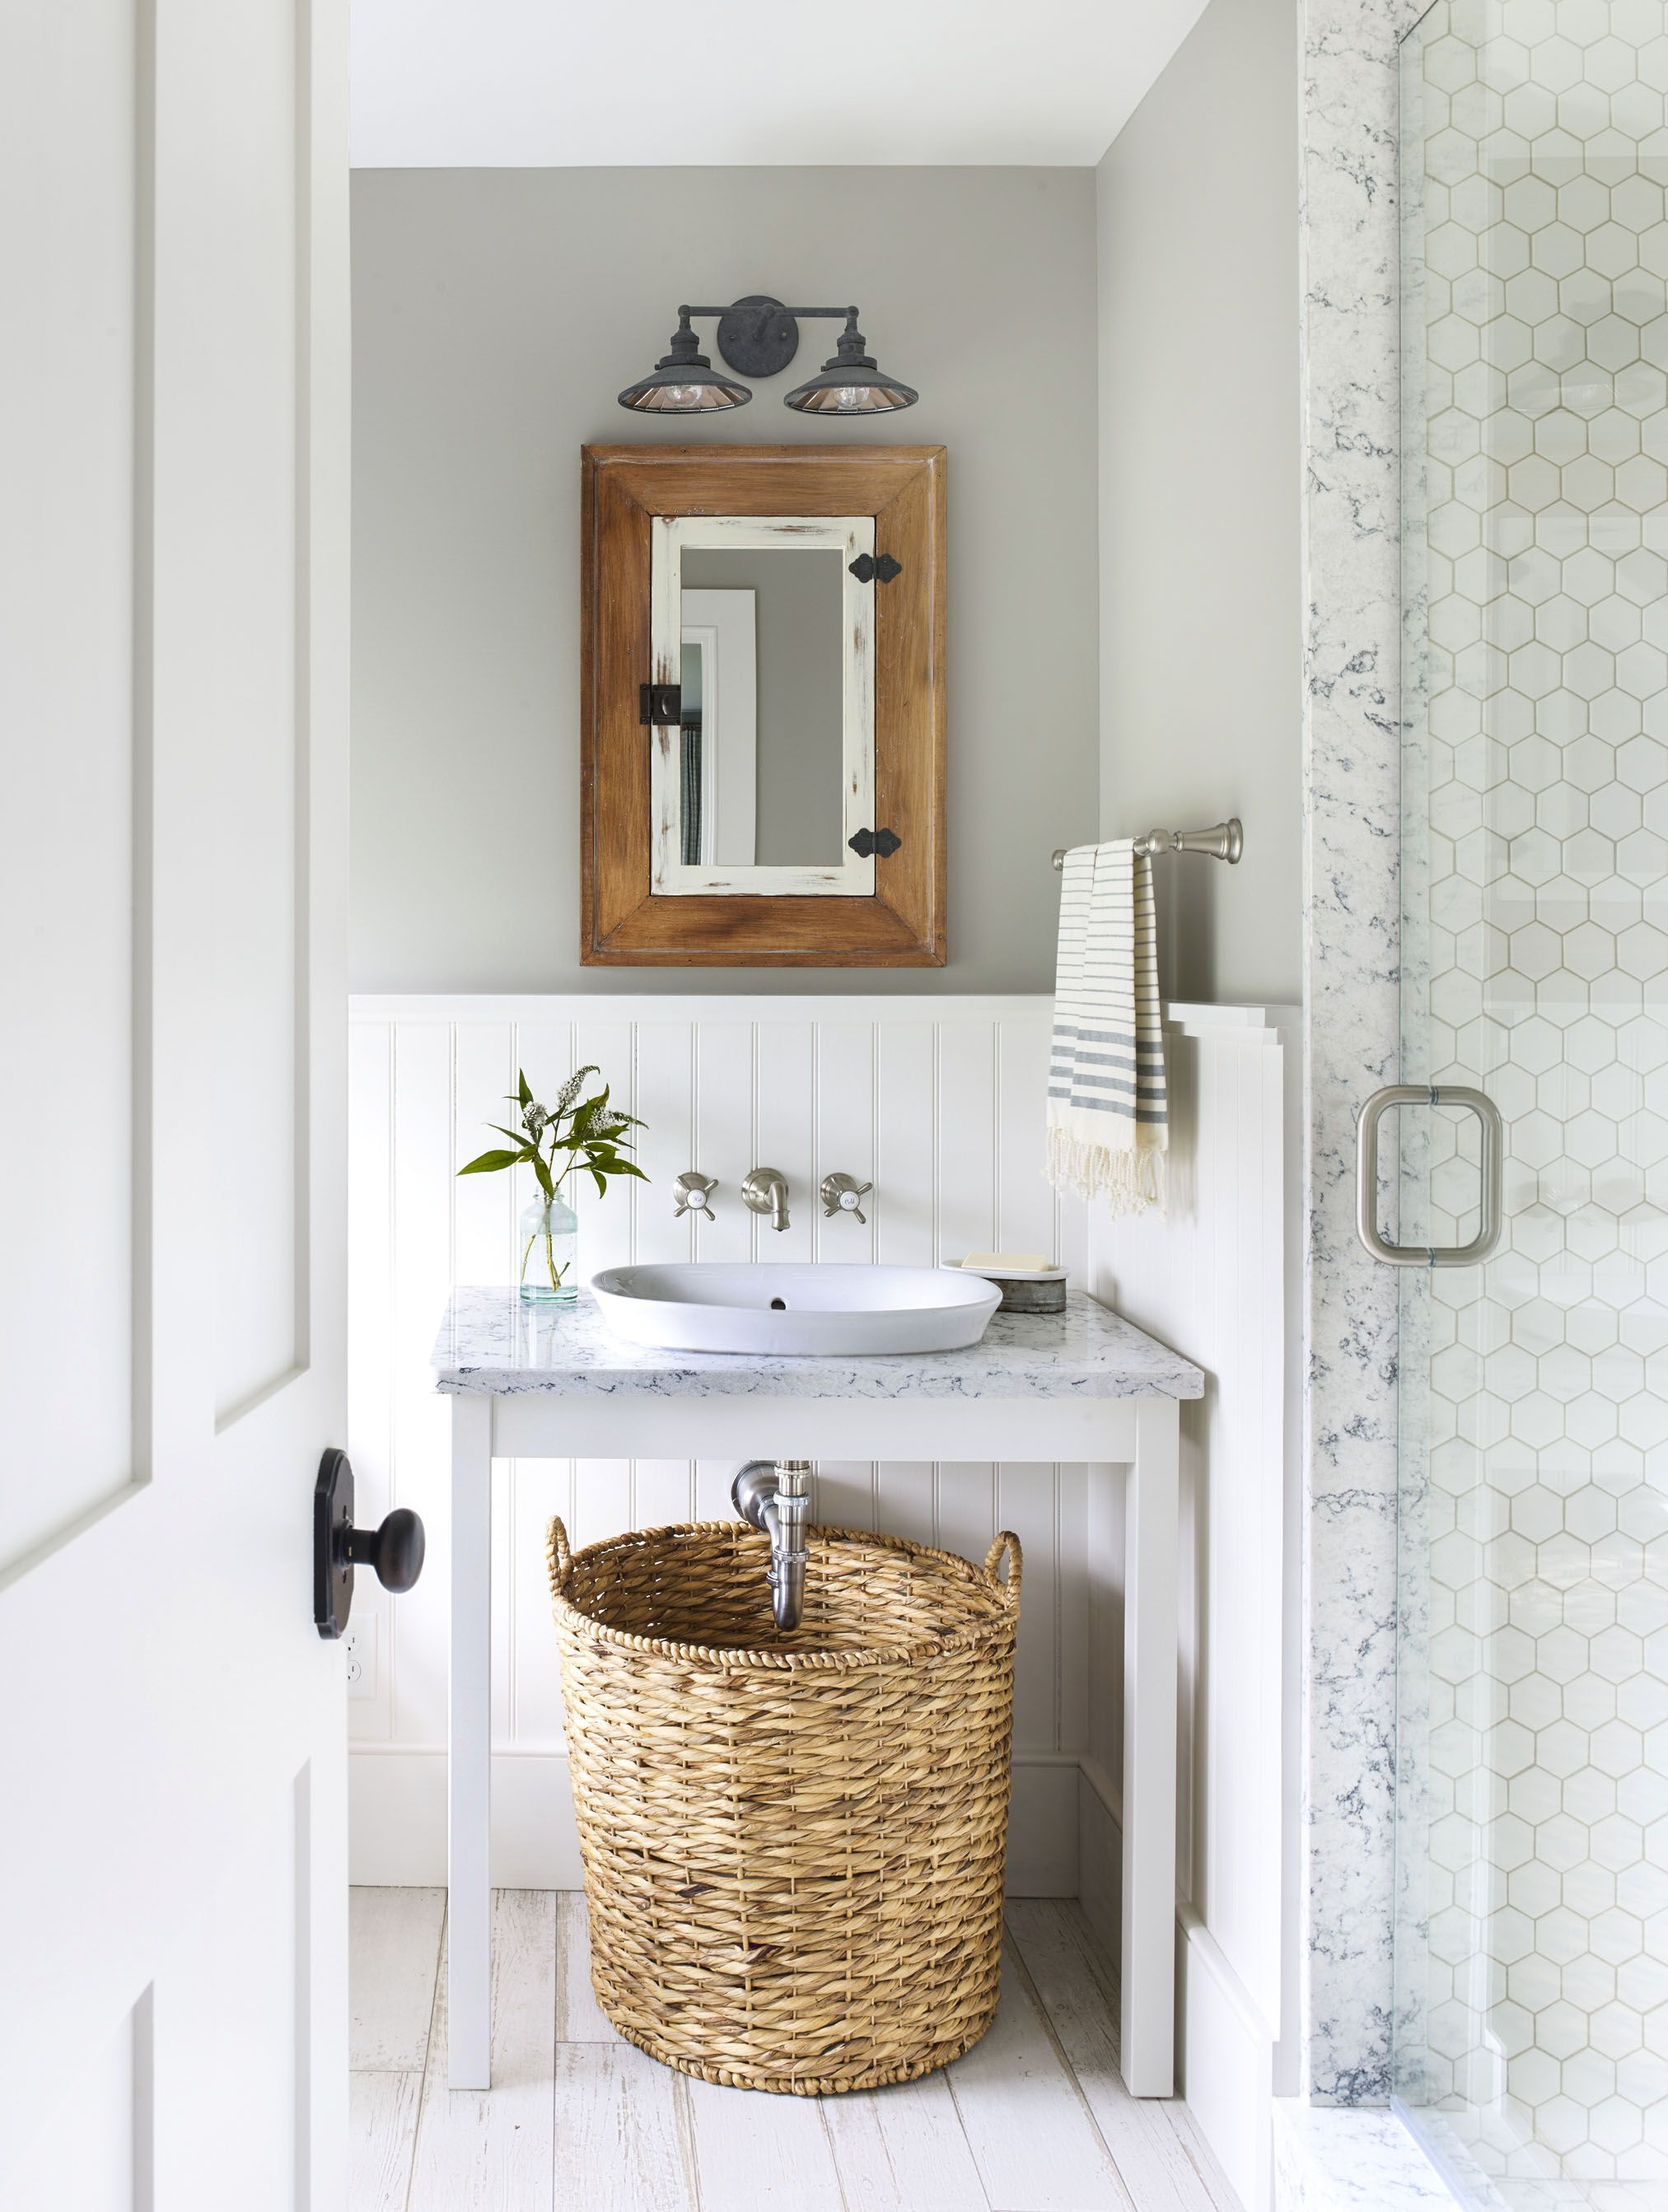 15 Best Bathroom Countertop Ideas Bathroom Countertop Sink